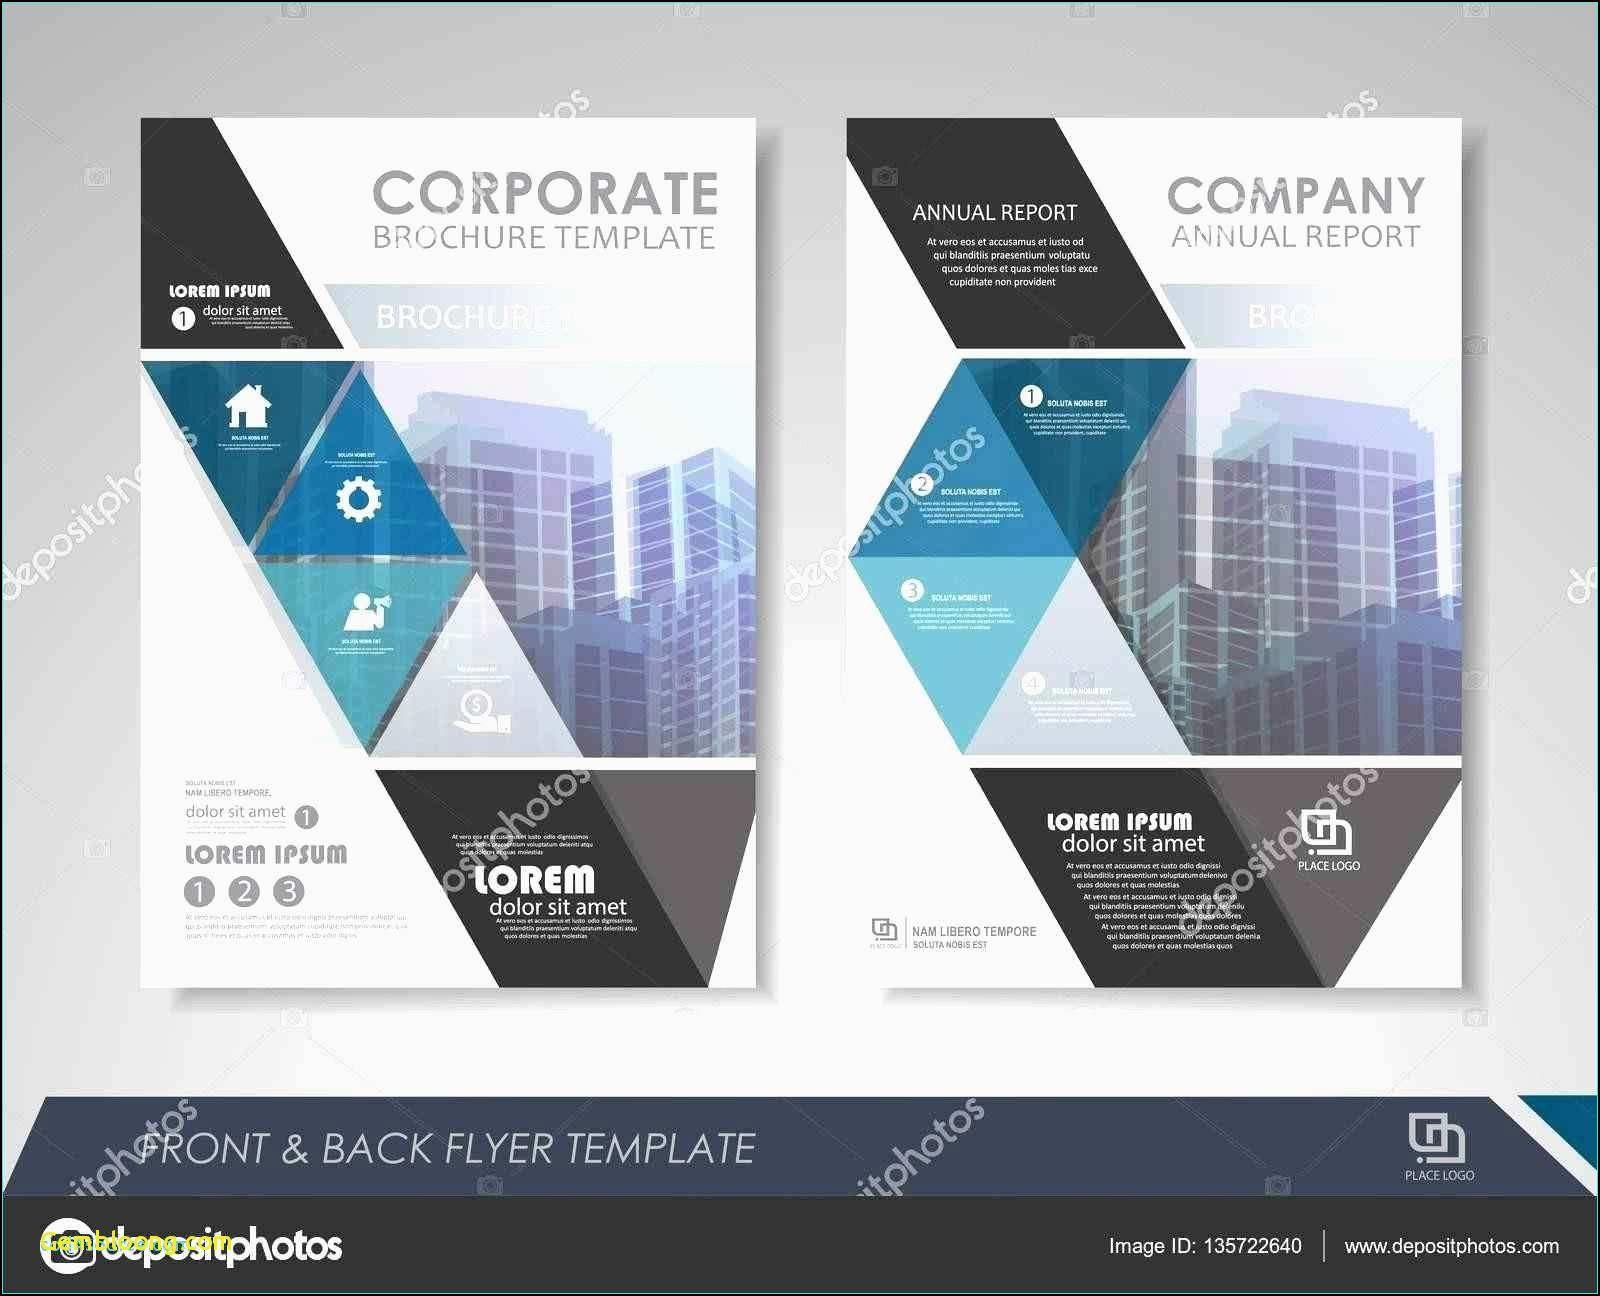 001 Marvelou Brochure Design Template Free Download Psd High Def Full